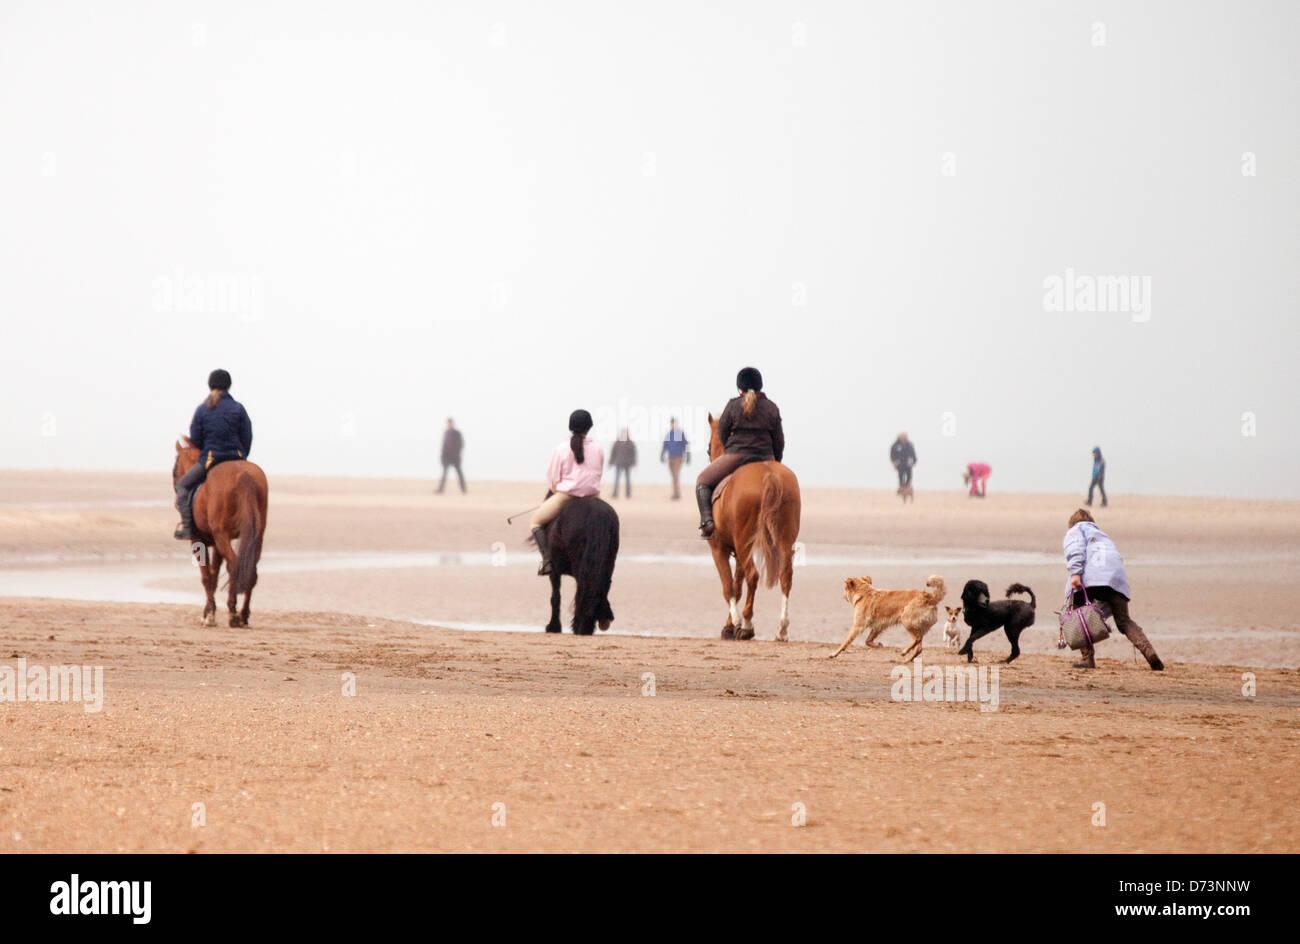 La gente caminando, a caballo y pasear perros, Holkham beach East Anglia, Norfolk, Inglaterra Imagen De Stock